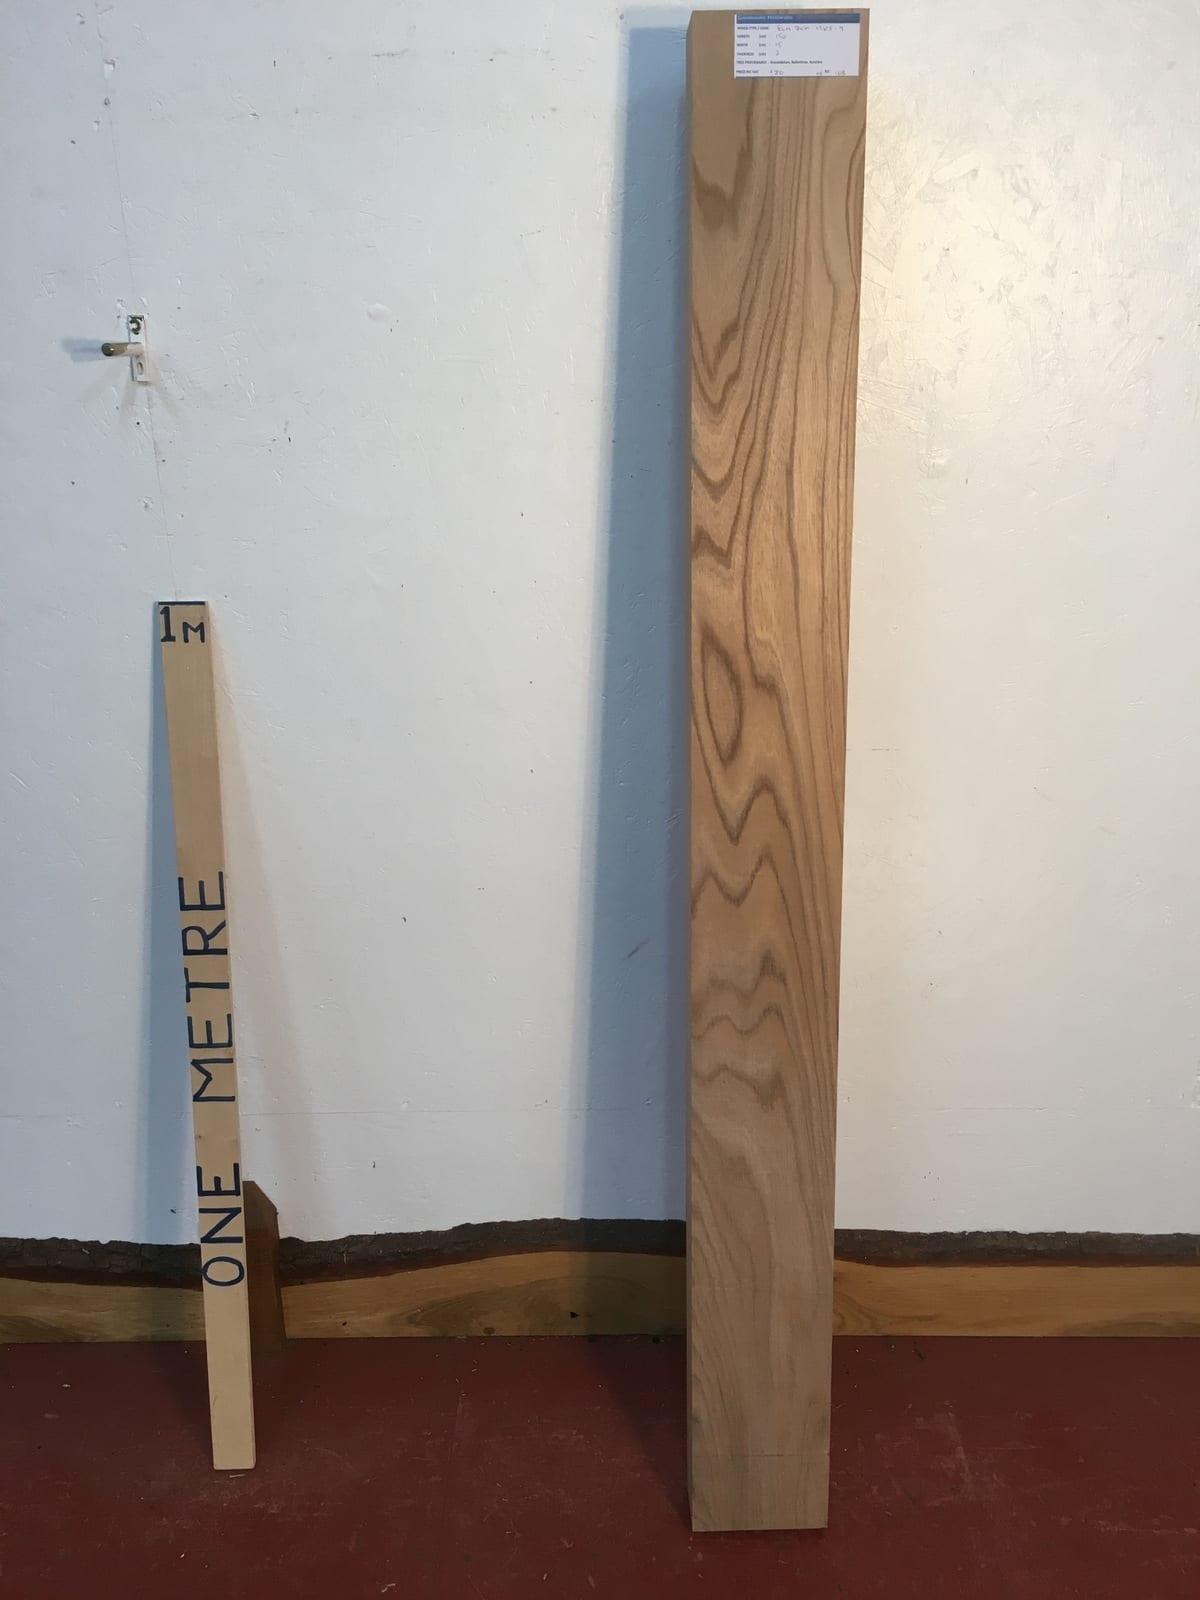 ELM 1385-9 PAR Planed All Round Square Edge Kiln Dried Seasoned Hardwood Timber Board Thickness 7cm Shelf Mantel